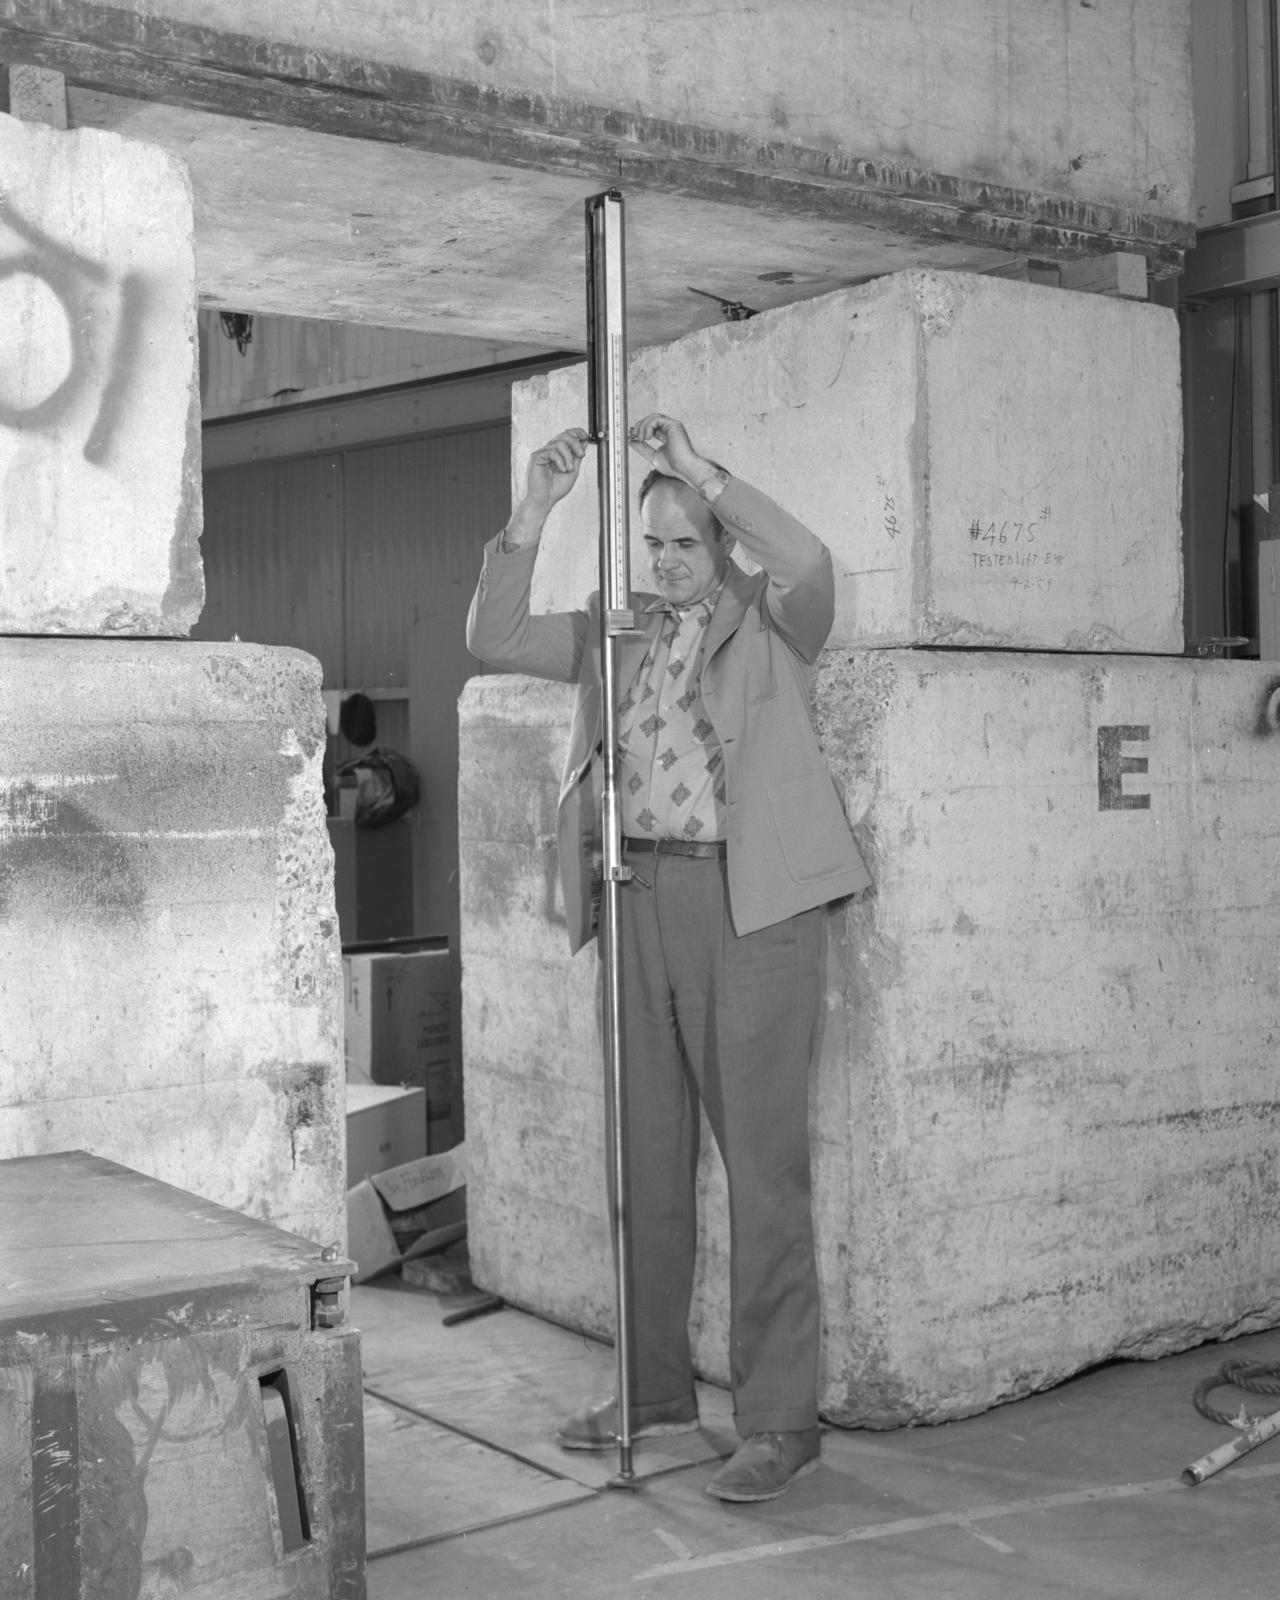 Tunnel elevation rod, Tran Canton. Photograph taken March 6, 1962. Bevatron-